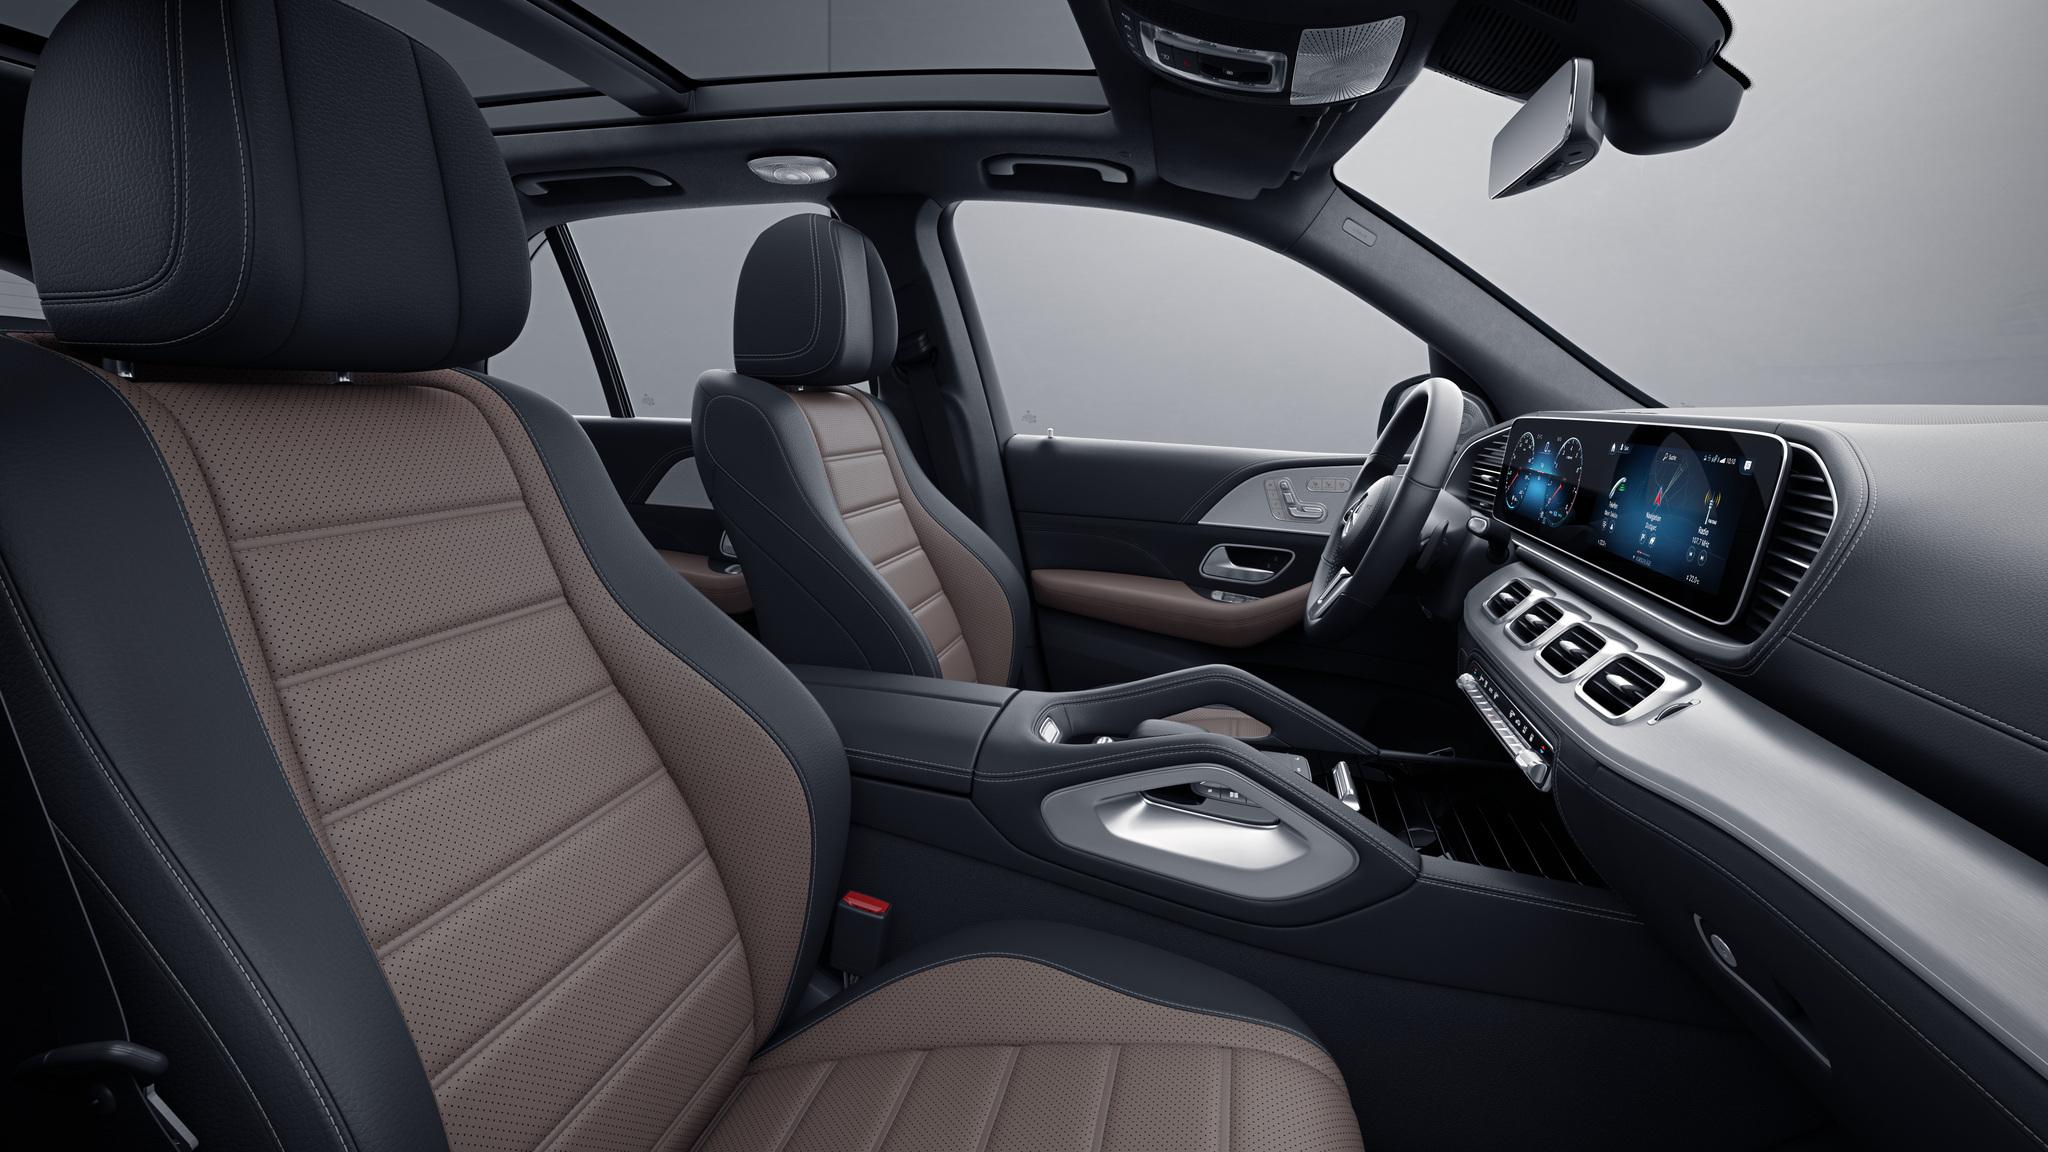 Habitacle de la Mercedes GLE -  Sellerie  Cuir Rough cuir bicolore - marron tartuffe  noir